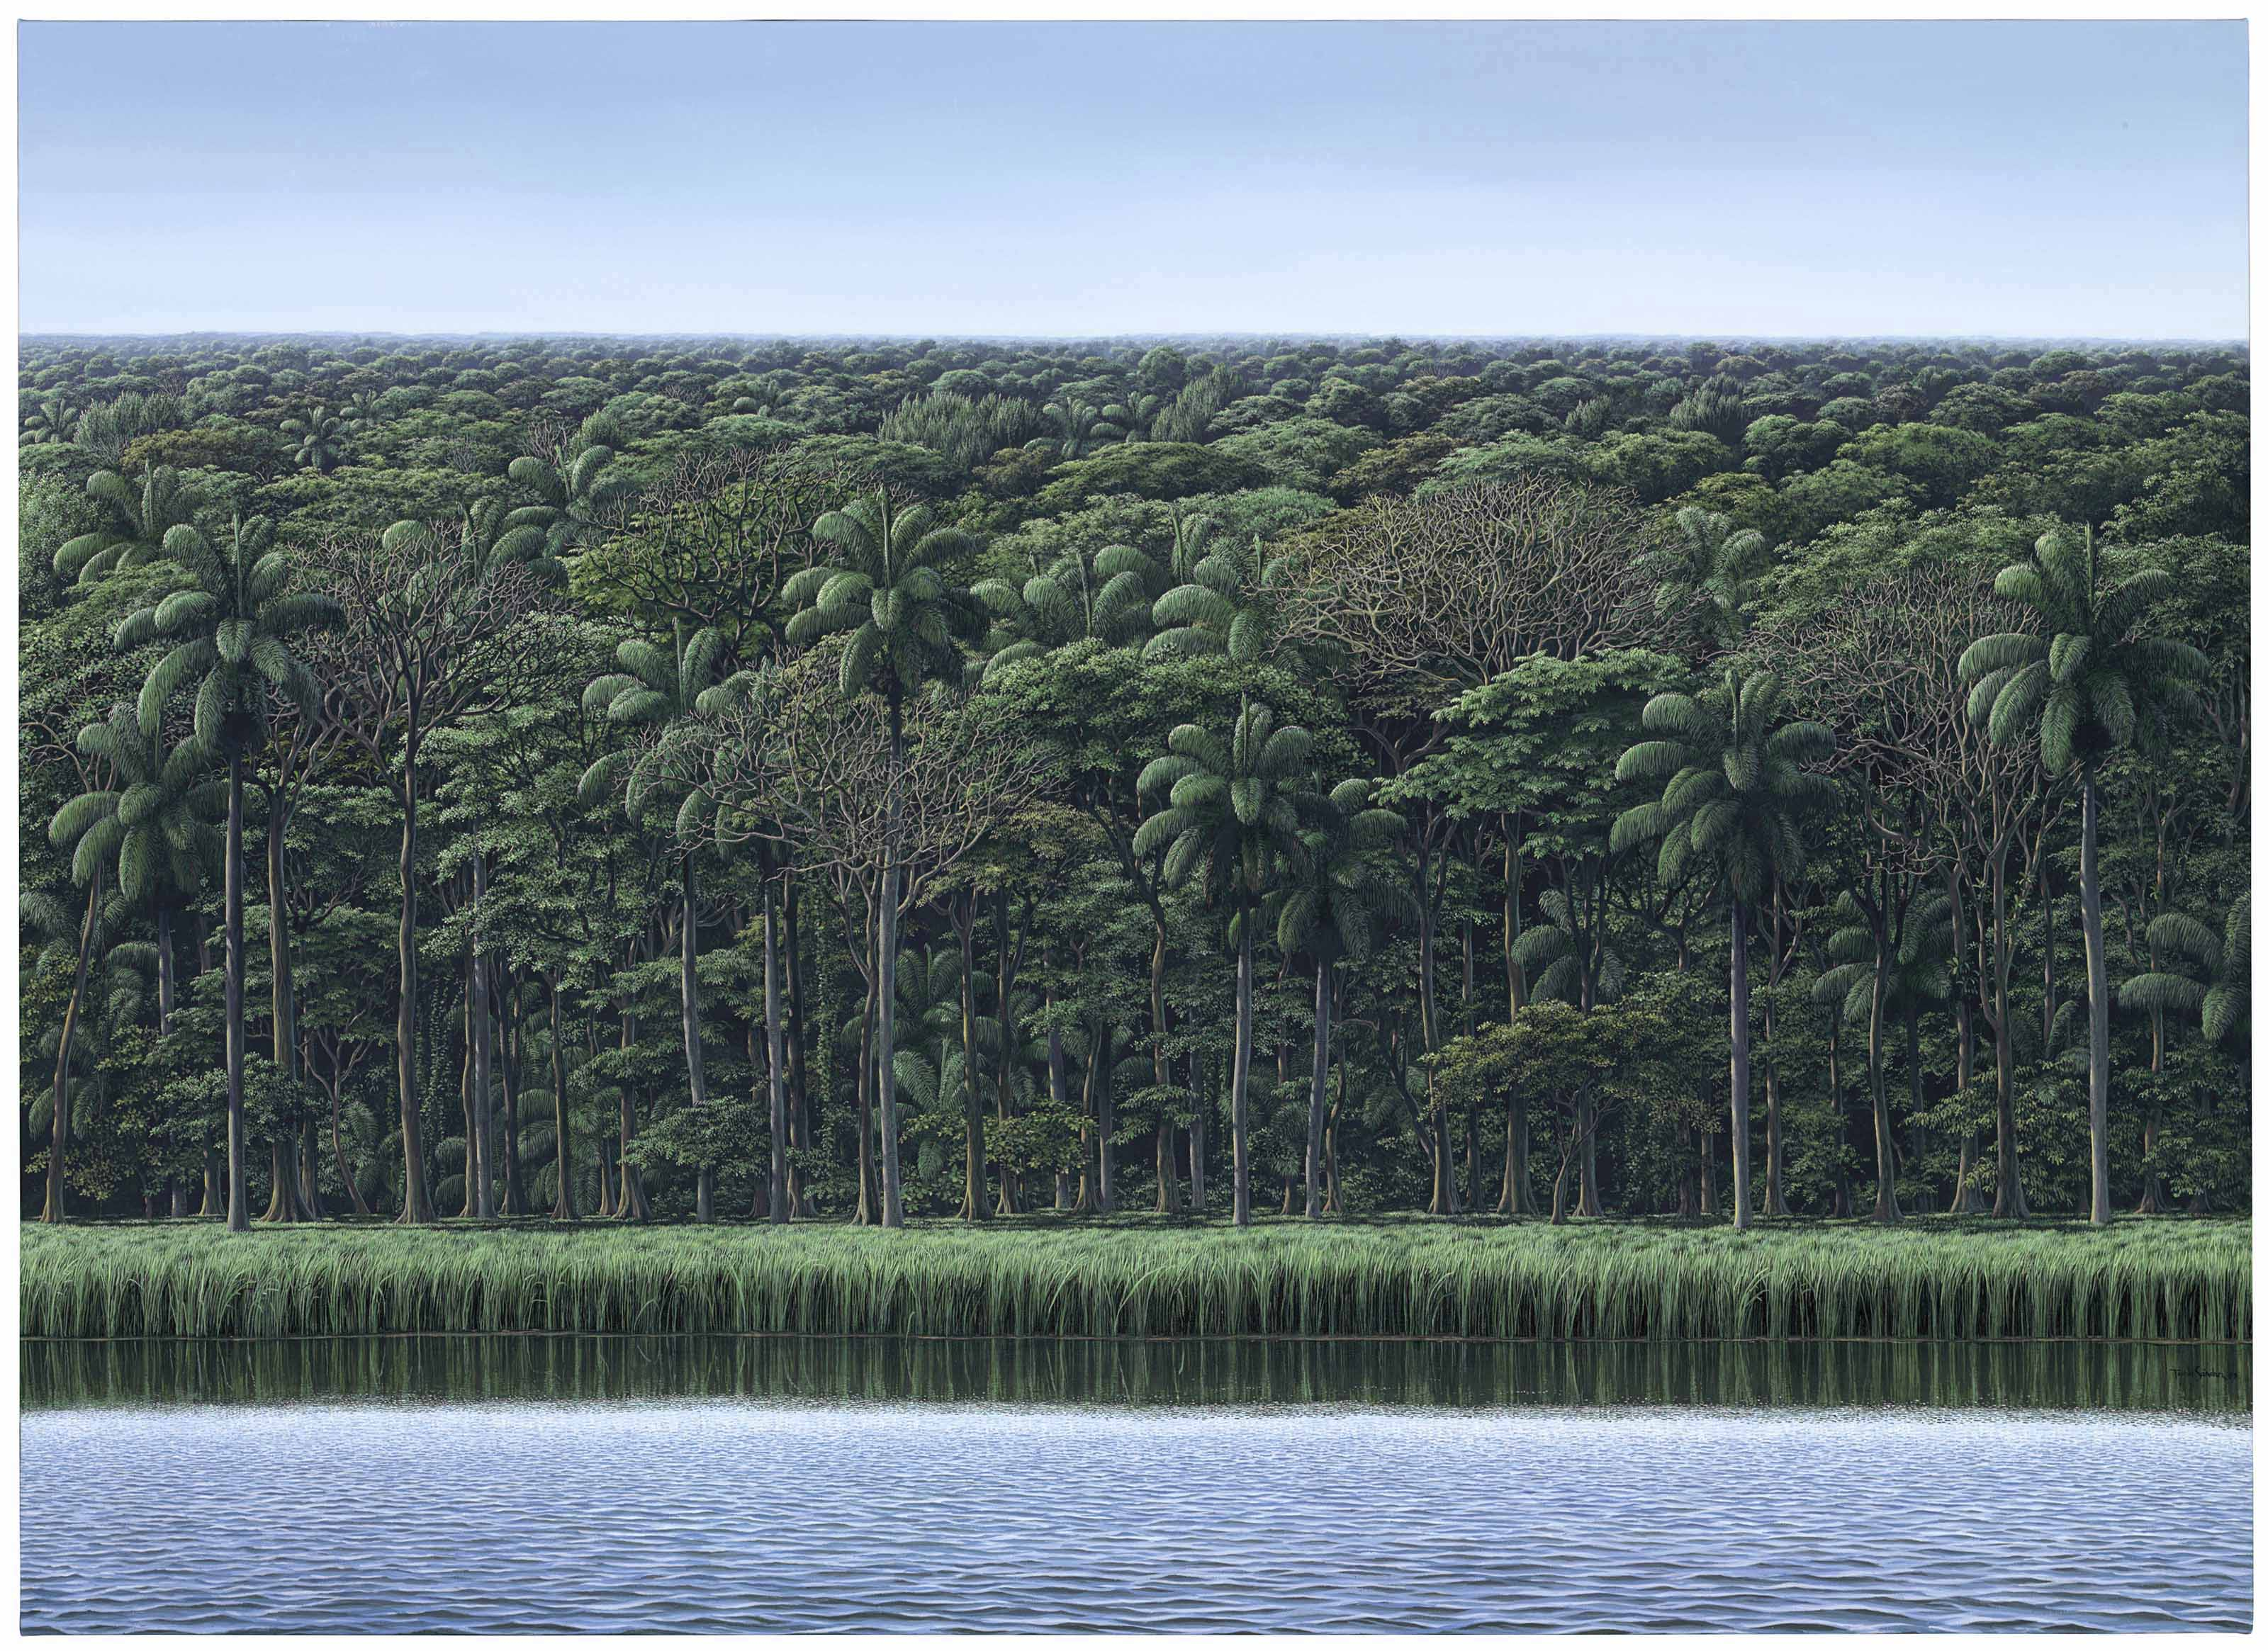 Tomás Sánchez (b. 1948), Visión de orilla, 2009. 48 x 66½  in (121.9 x 168.9  cm). Estimate $400,000-600,000. Offered in Latin American Art on 23-24 May at Christie's in New York